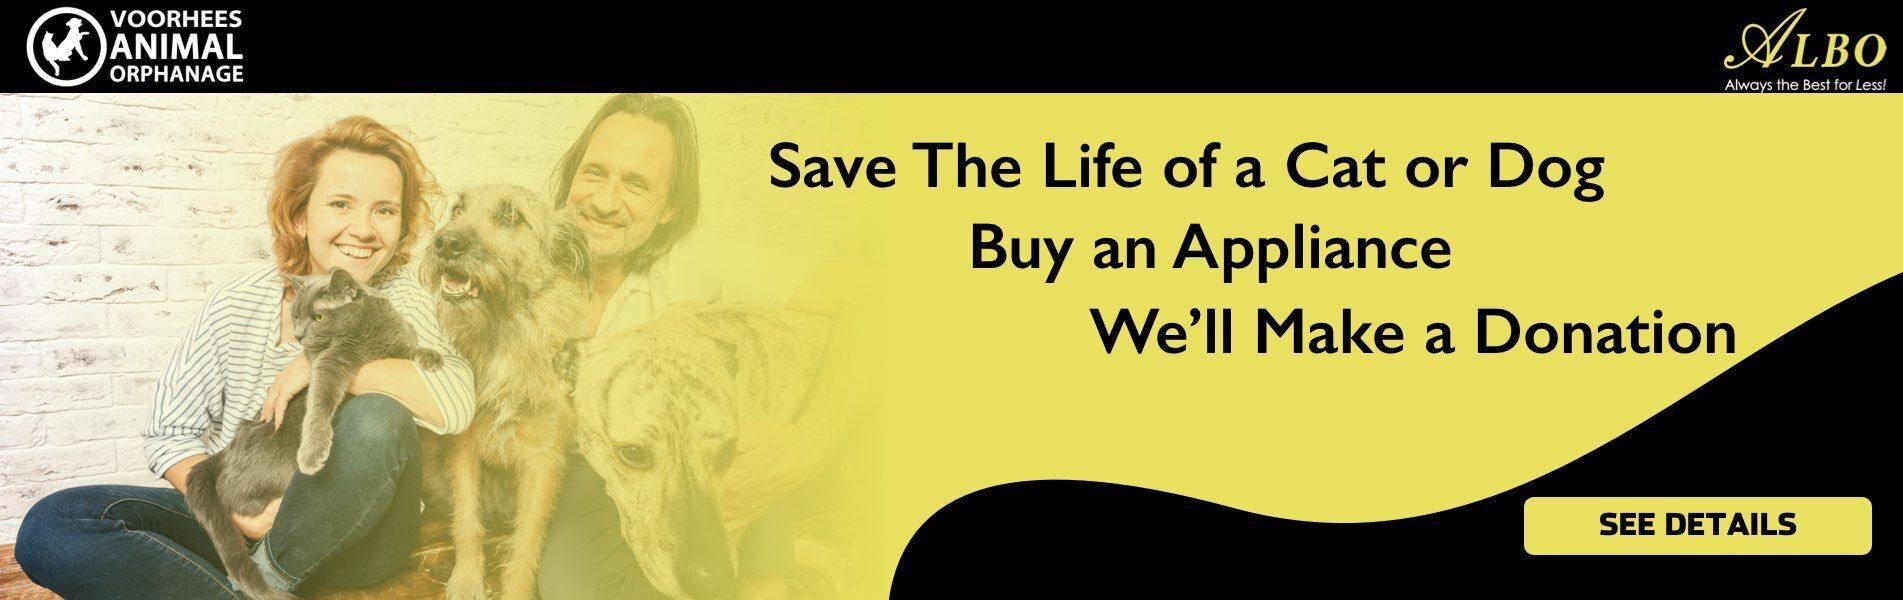 AlboAppliance-VoorheesAnimalHospital-Partnership